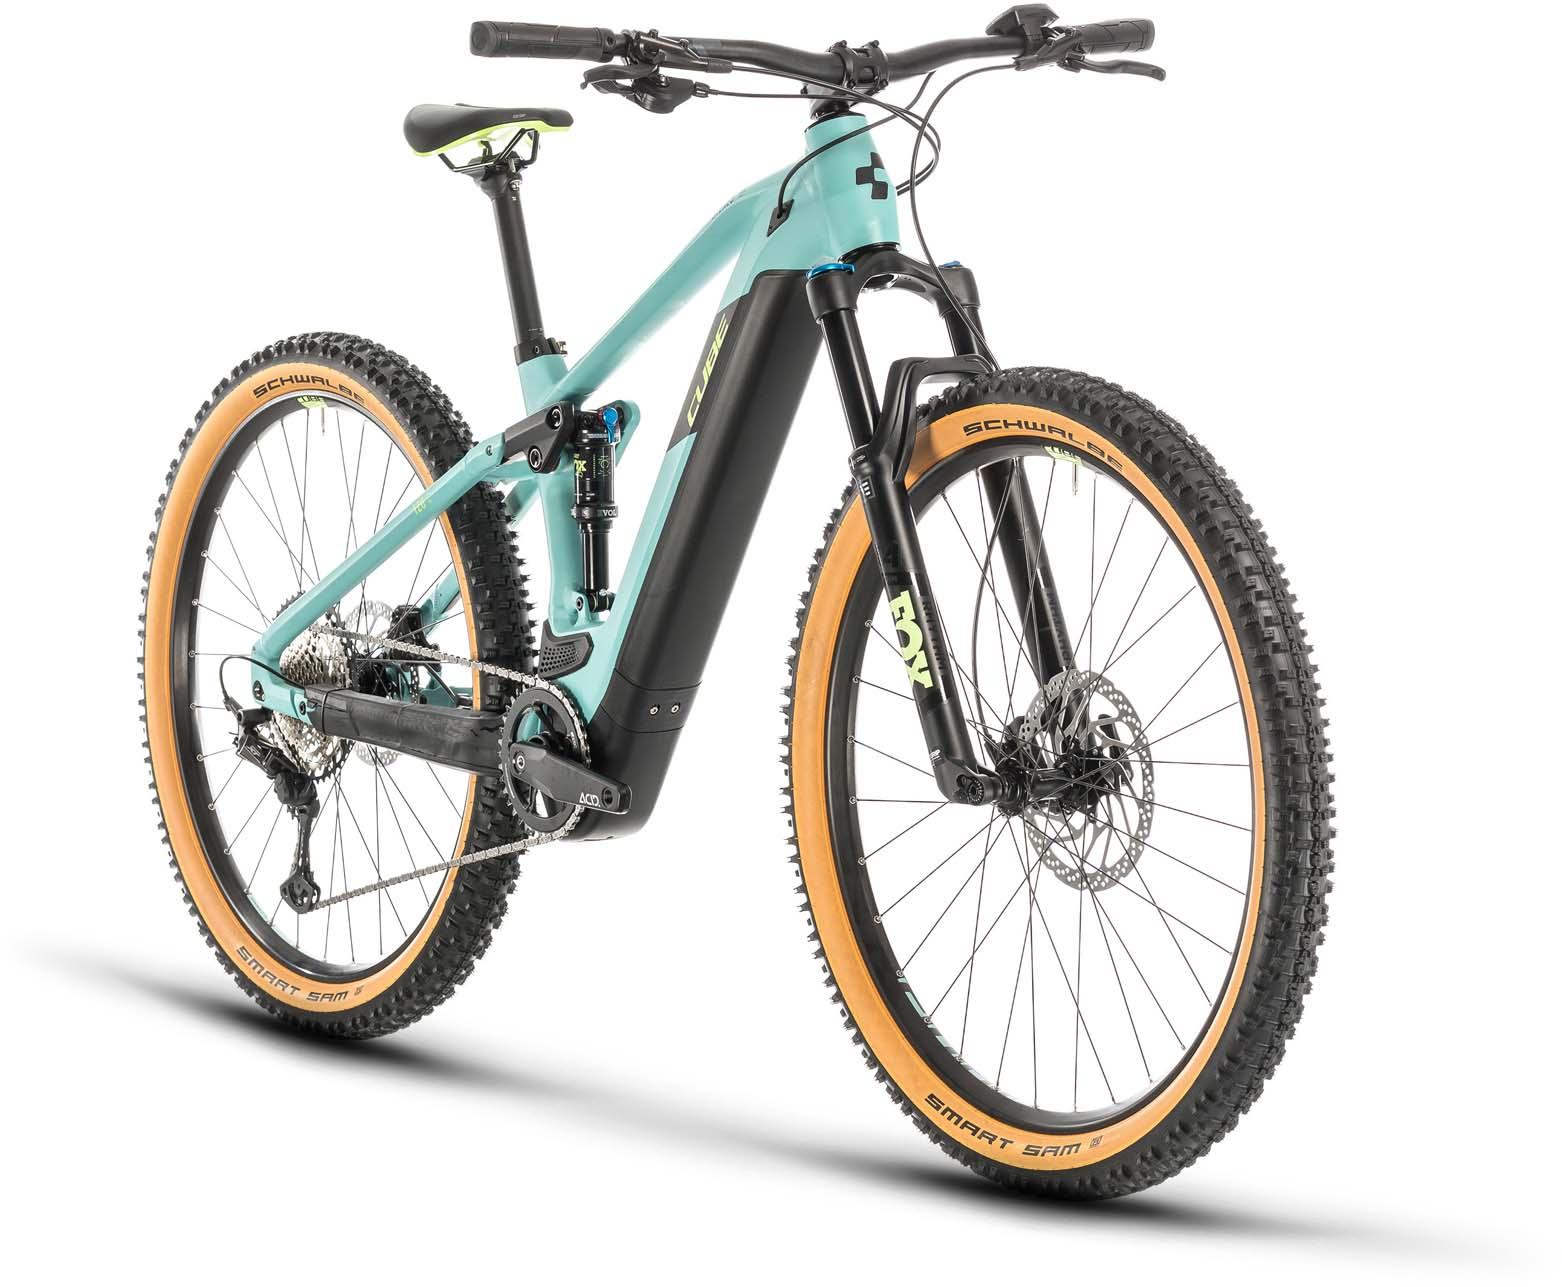 cube stereo hybrid 120 race 625 29 frozengreen n green 2020 e bike fully mtb mhw. Black Bedroom Furniture Sets. Home Design Ideas